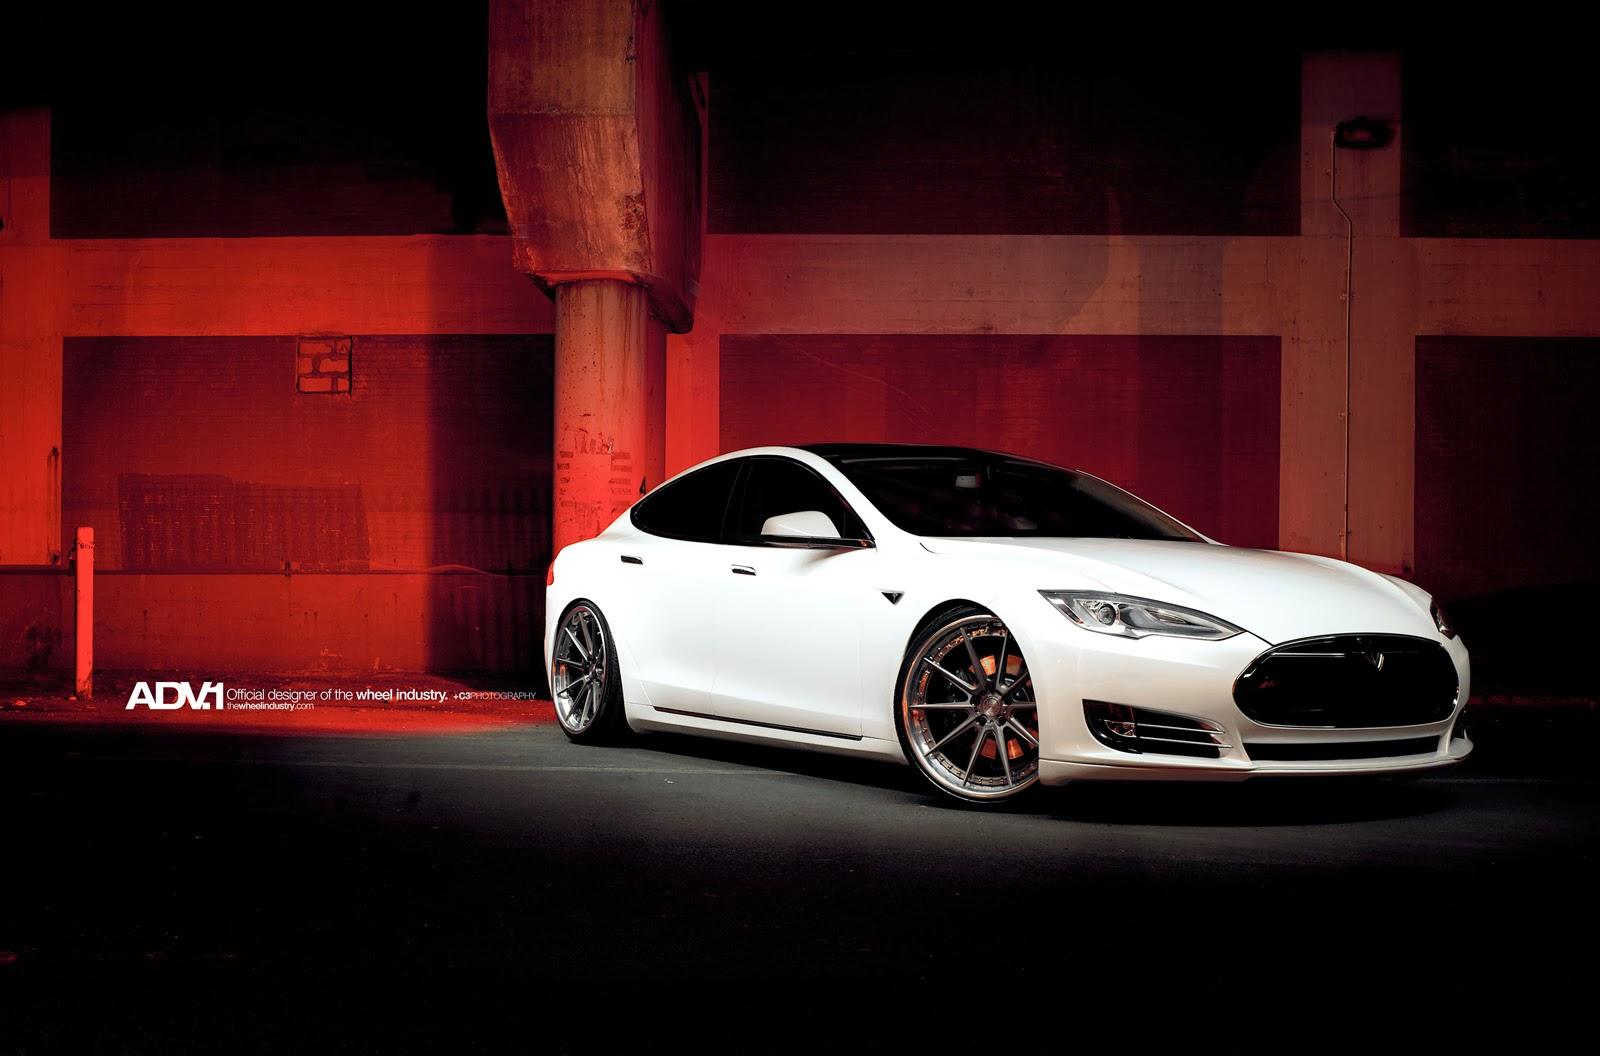 TeslaS_ADV1_01.jpeg